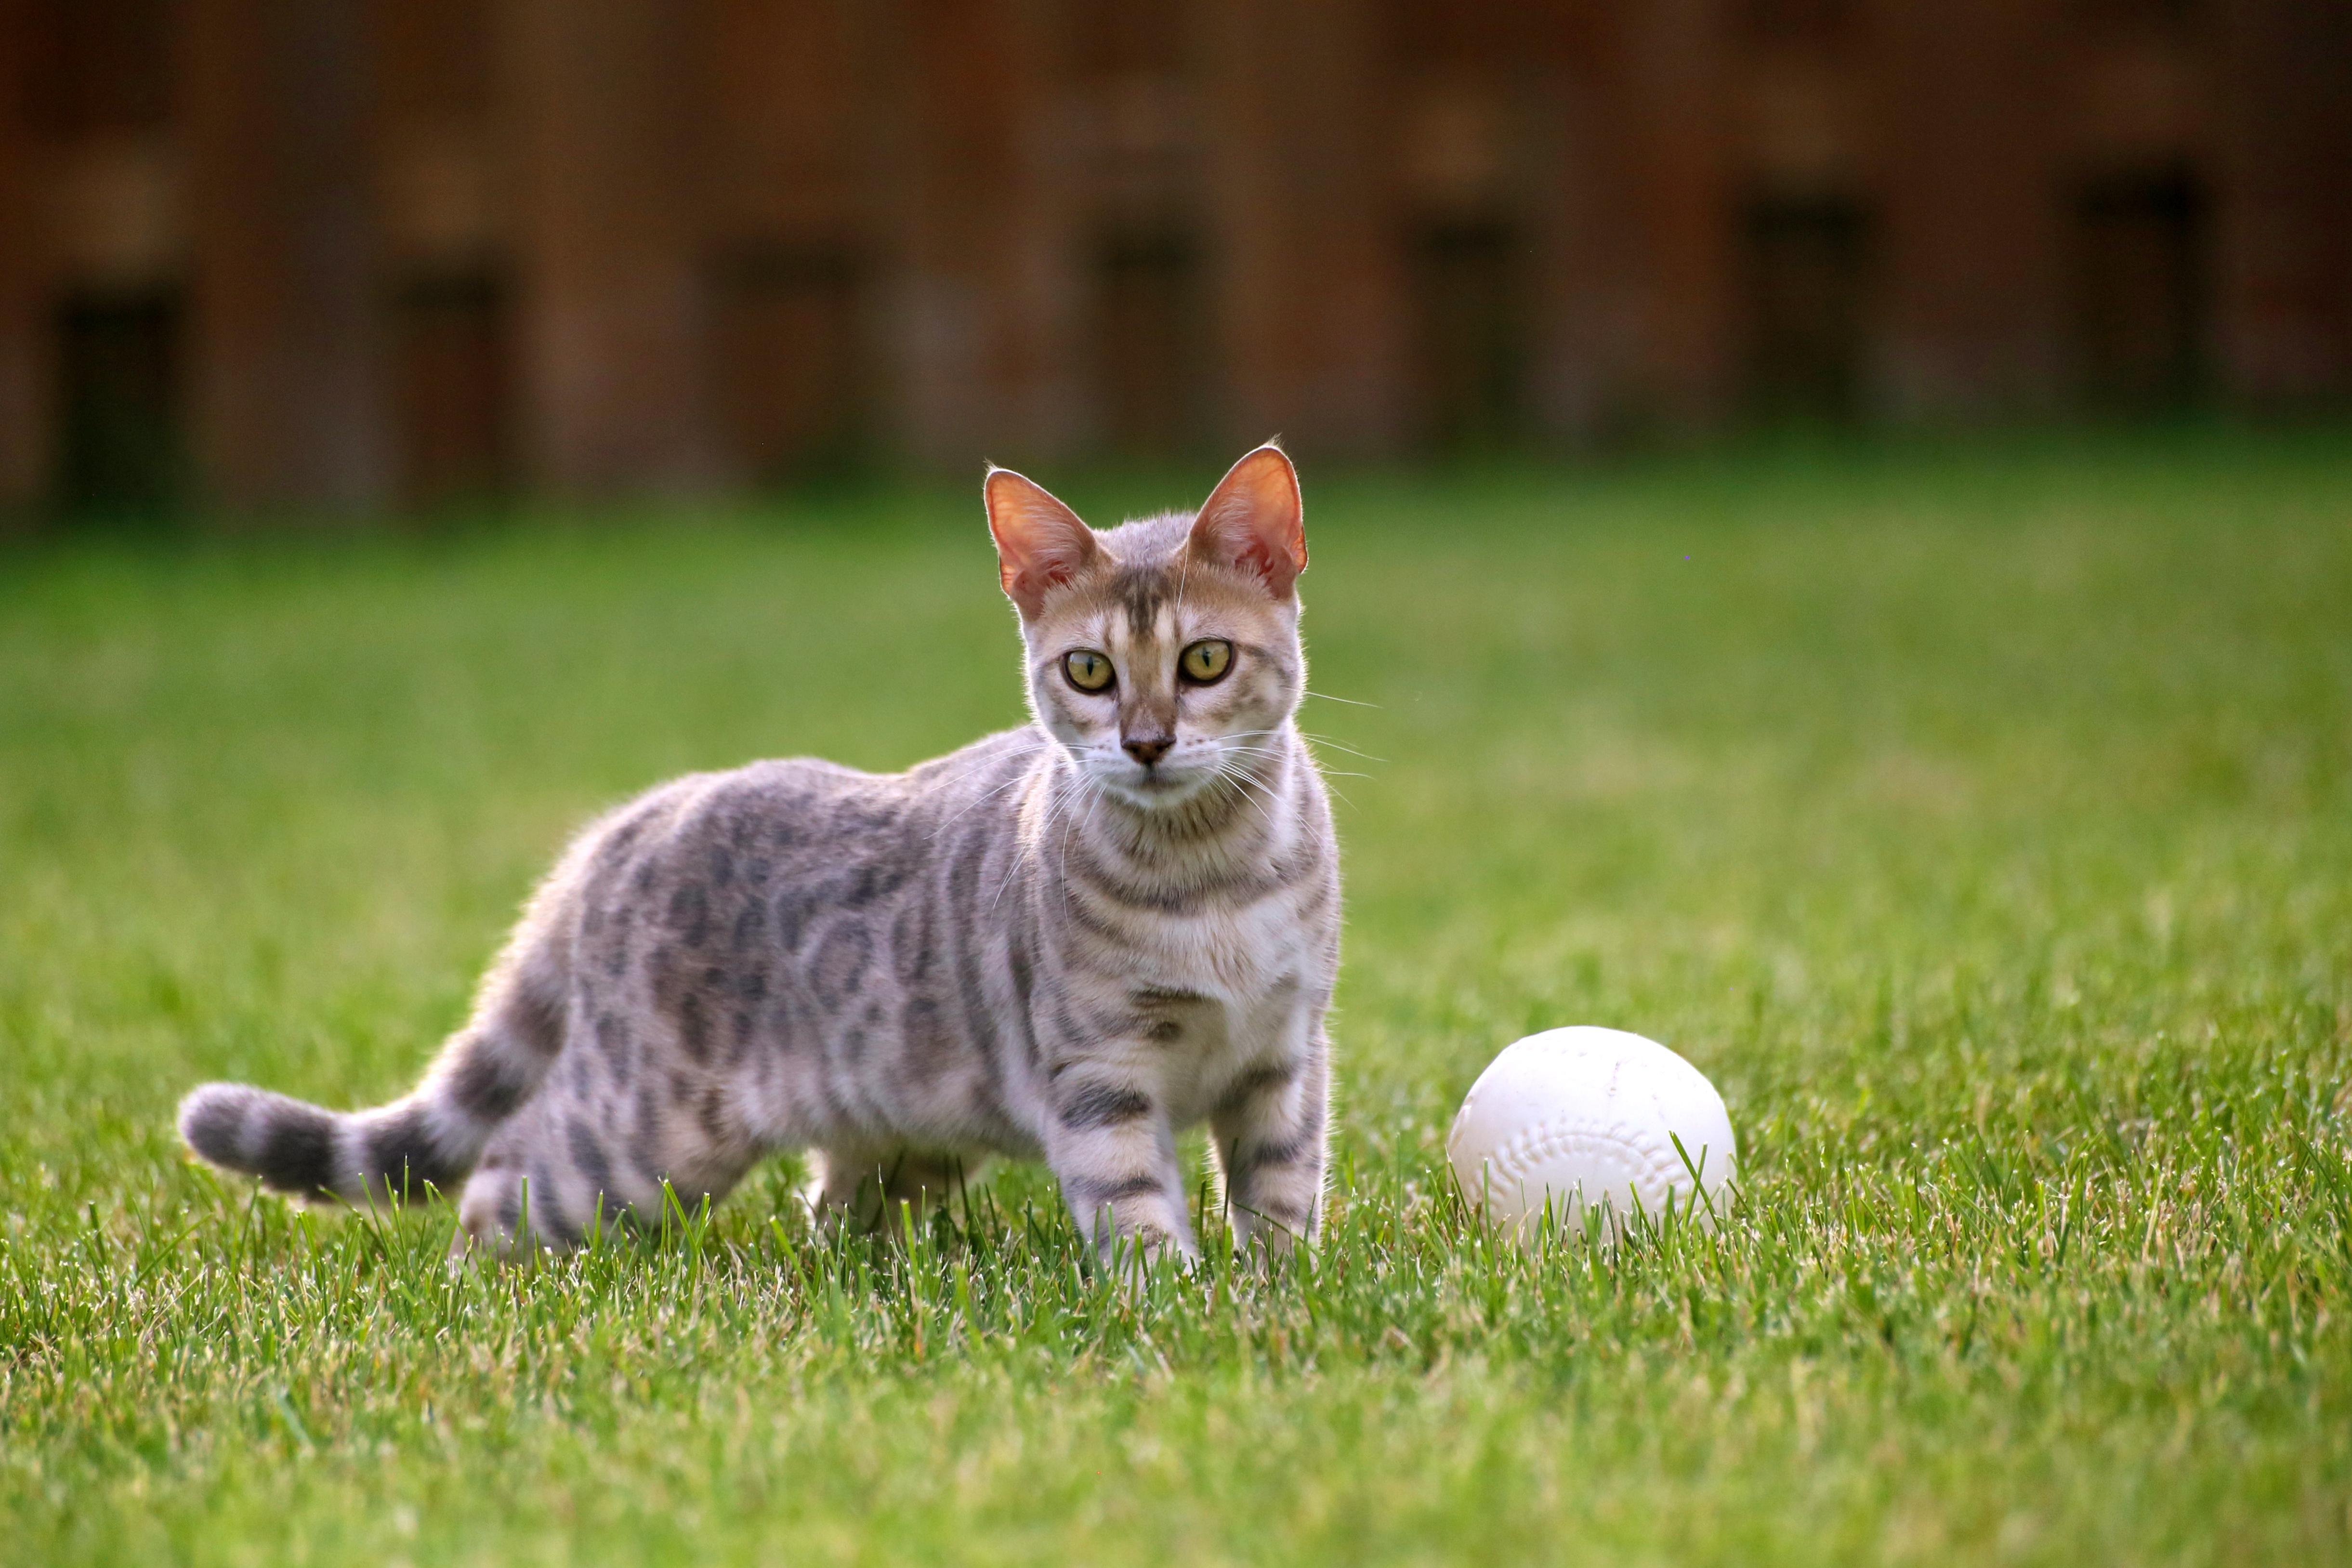 Blue bengal kitten: taste of freedom - 4, Animal, Game, Play, Pet, HQ Photo